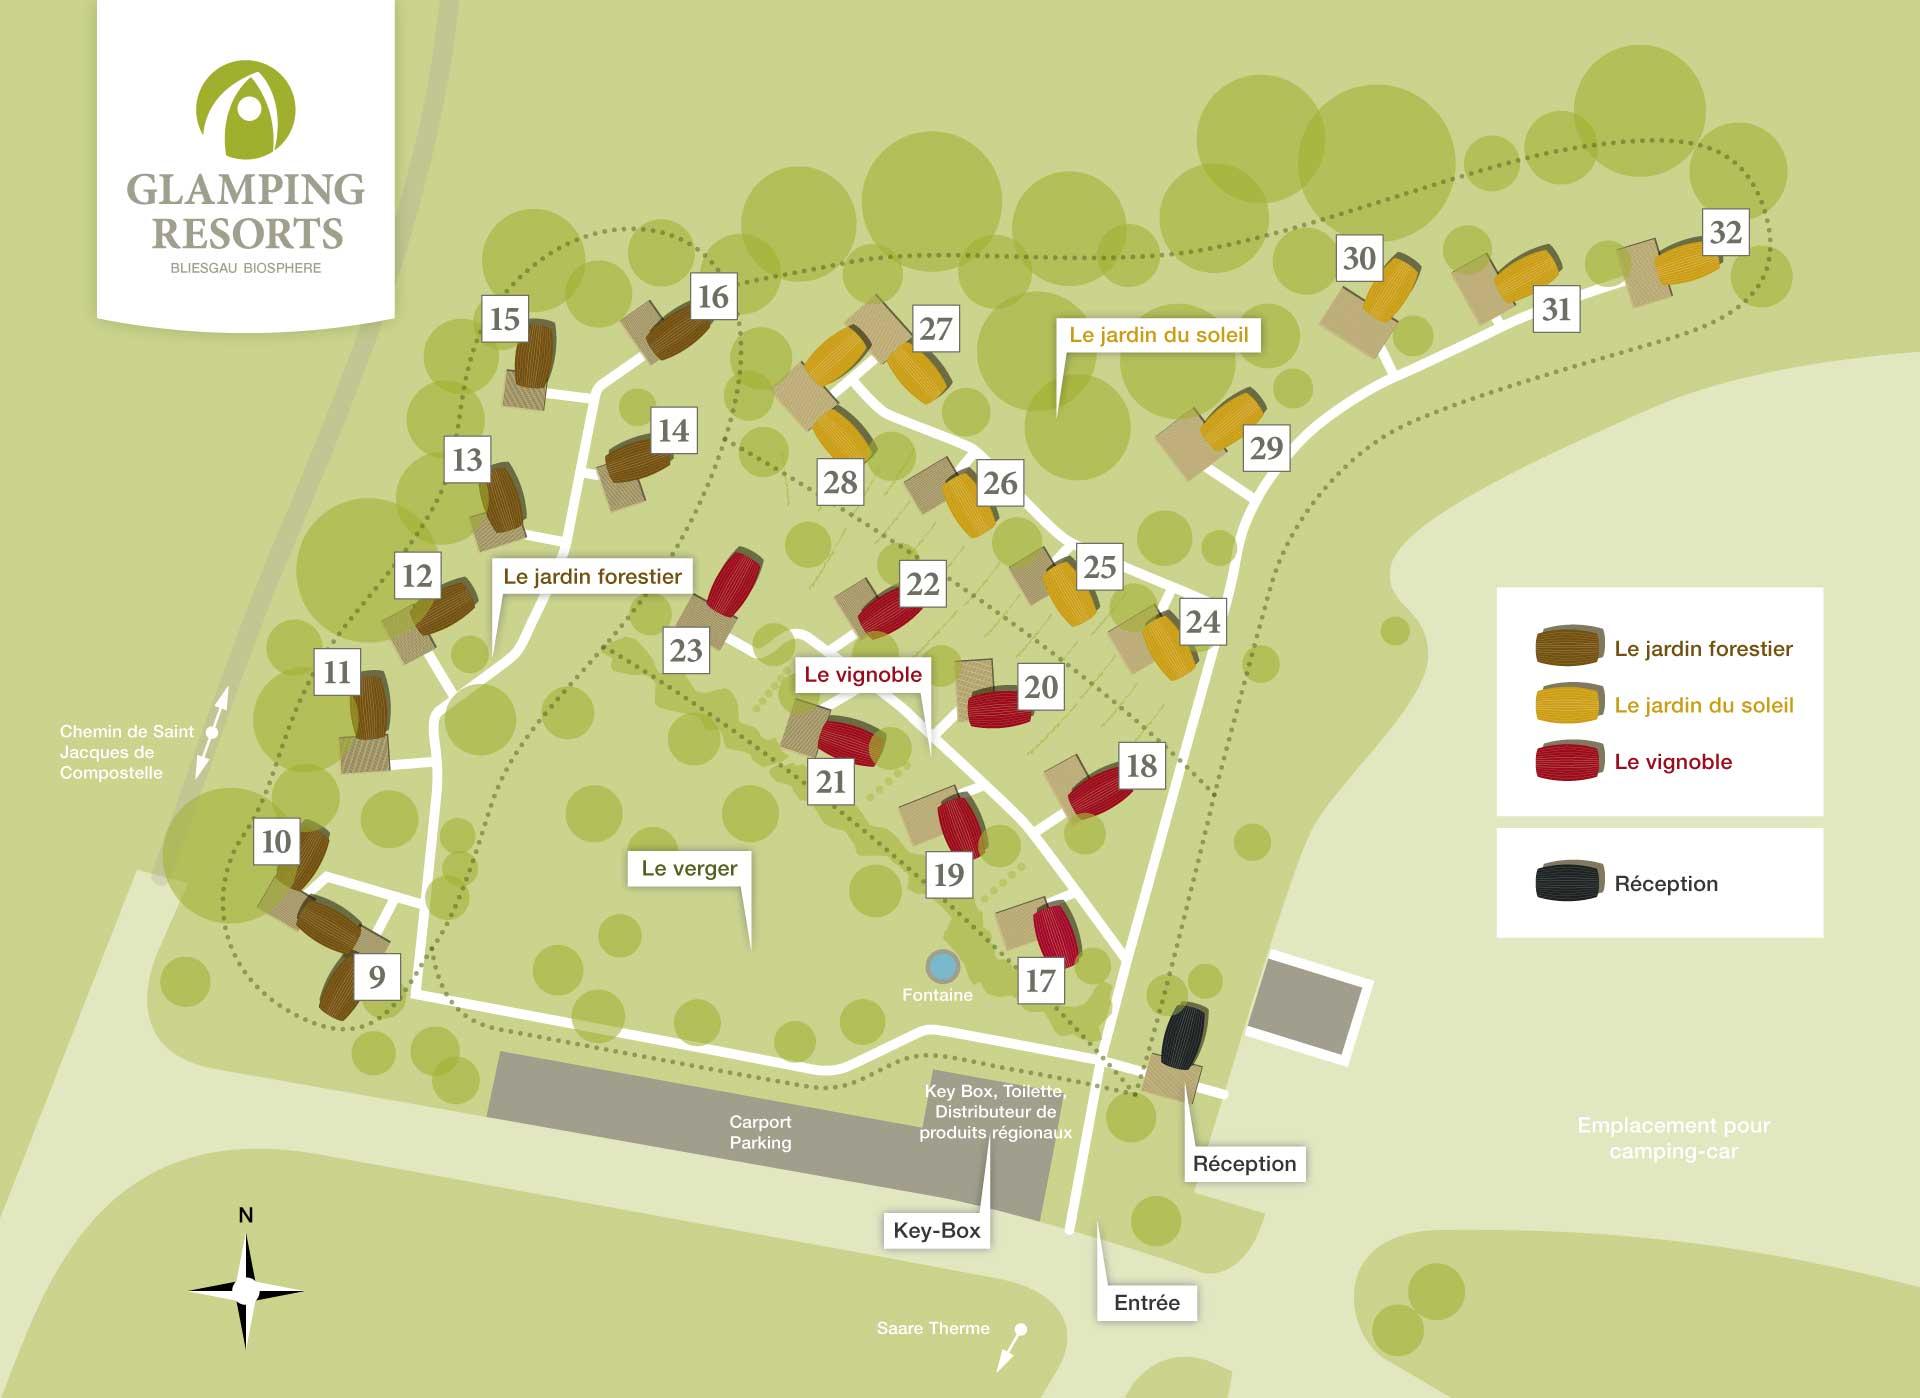 Carte du Glamping Resort Biosphère Bliesgau